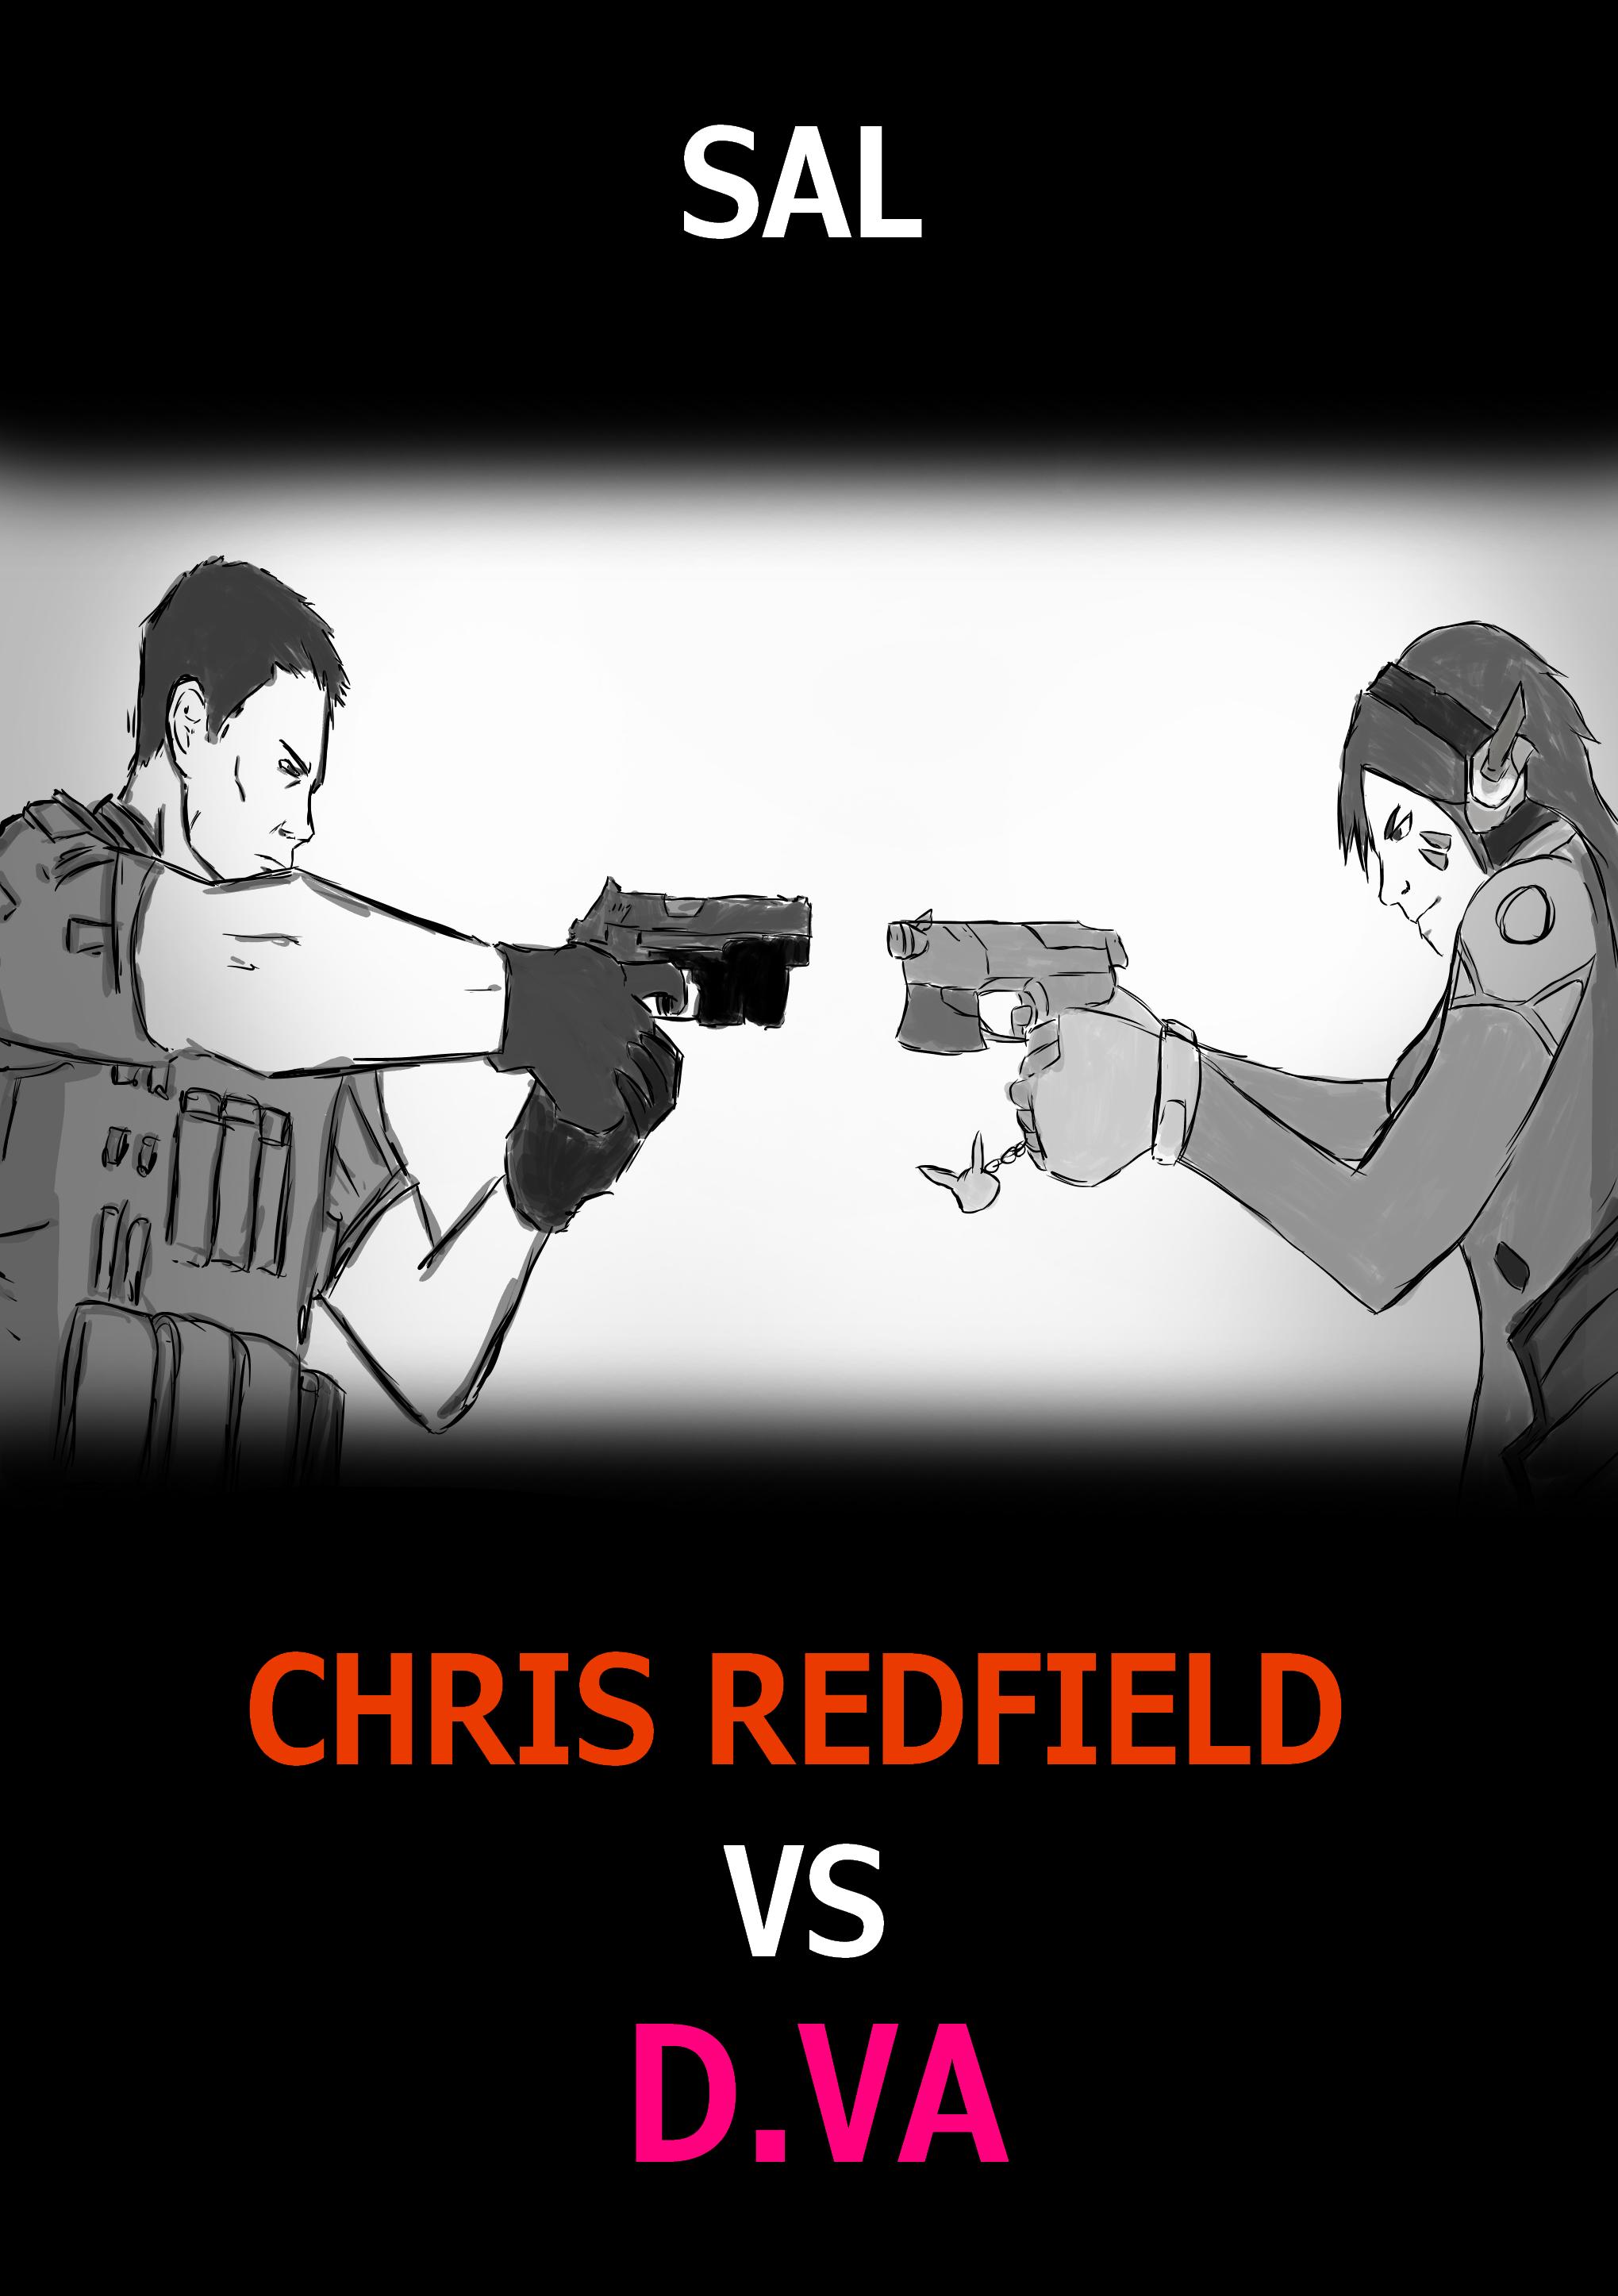 Chris vs D.VA